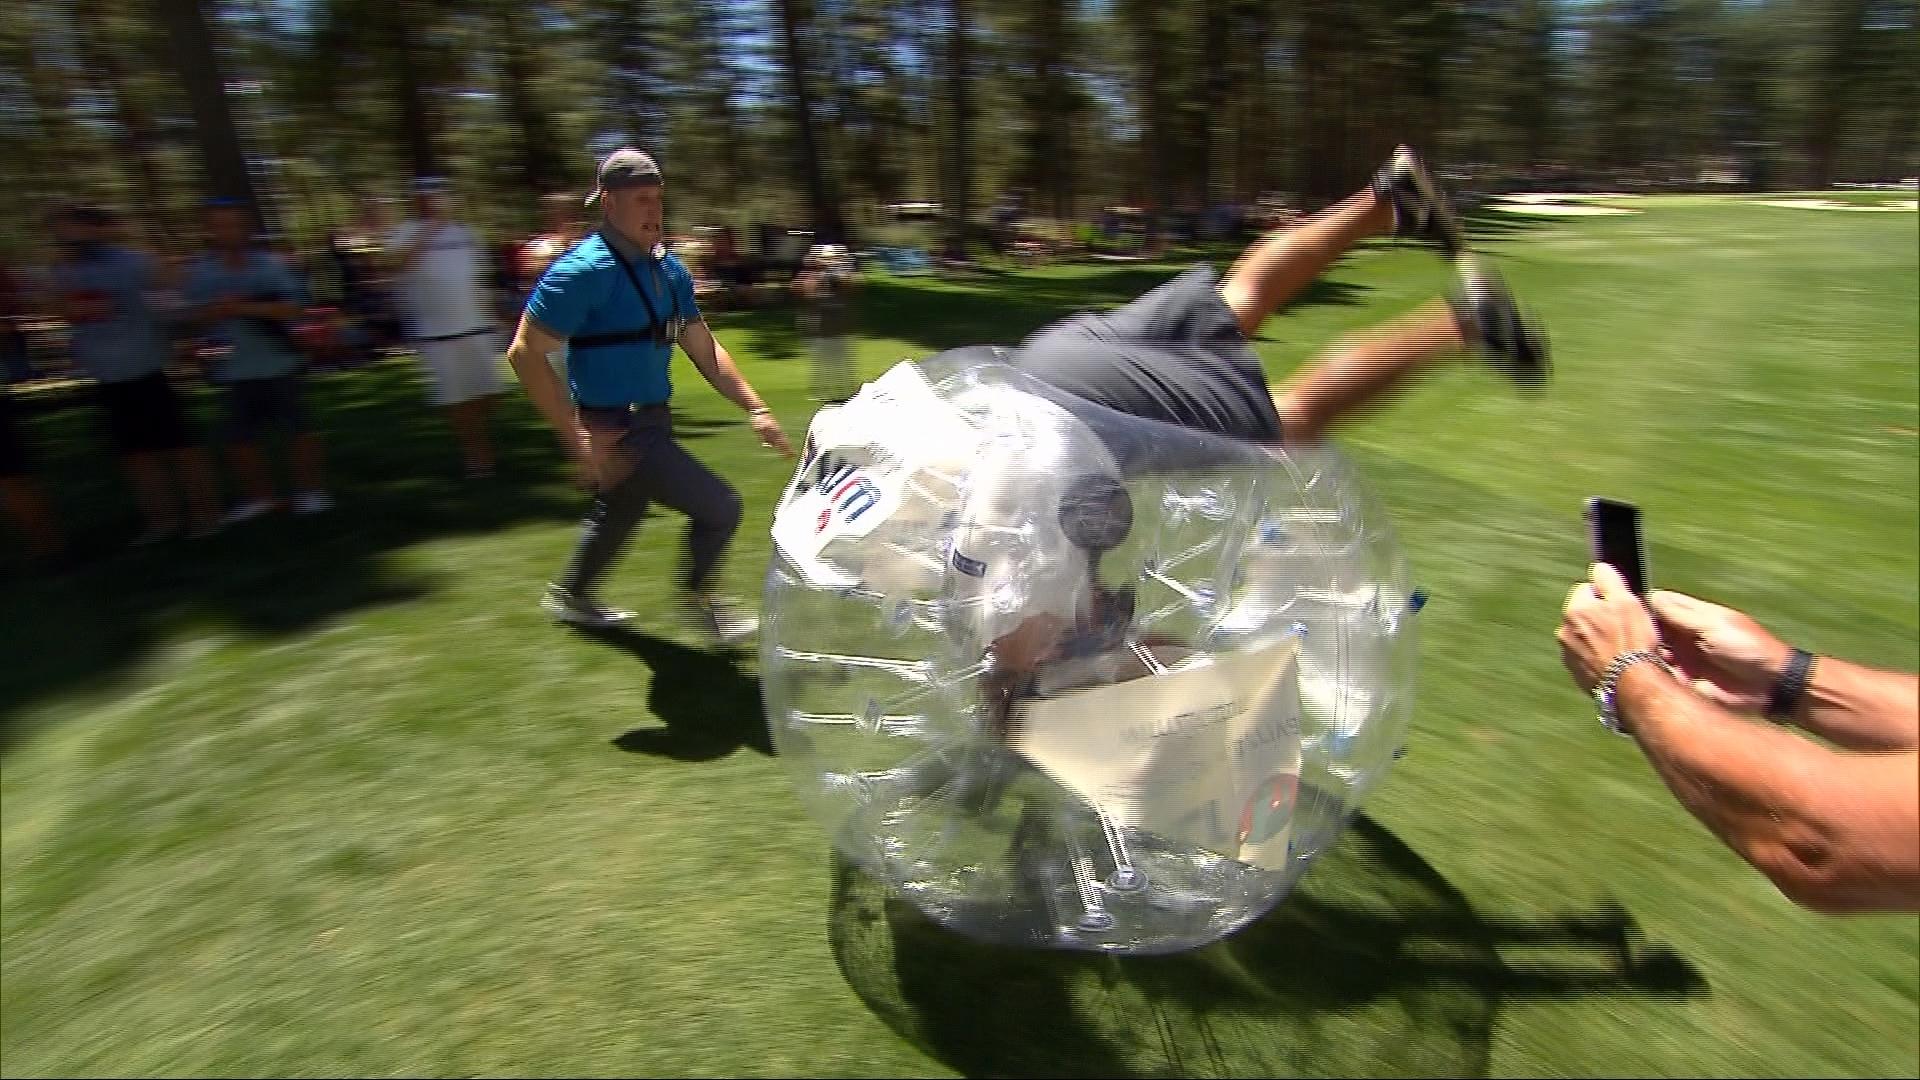 https://golfchannel-a.akamaihd.net/ramp/602/963/HAWK_072216.jpg